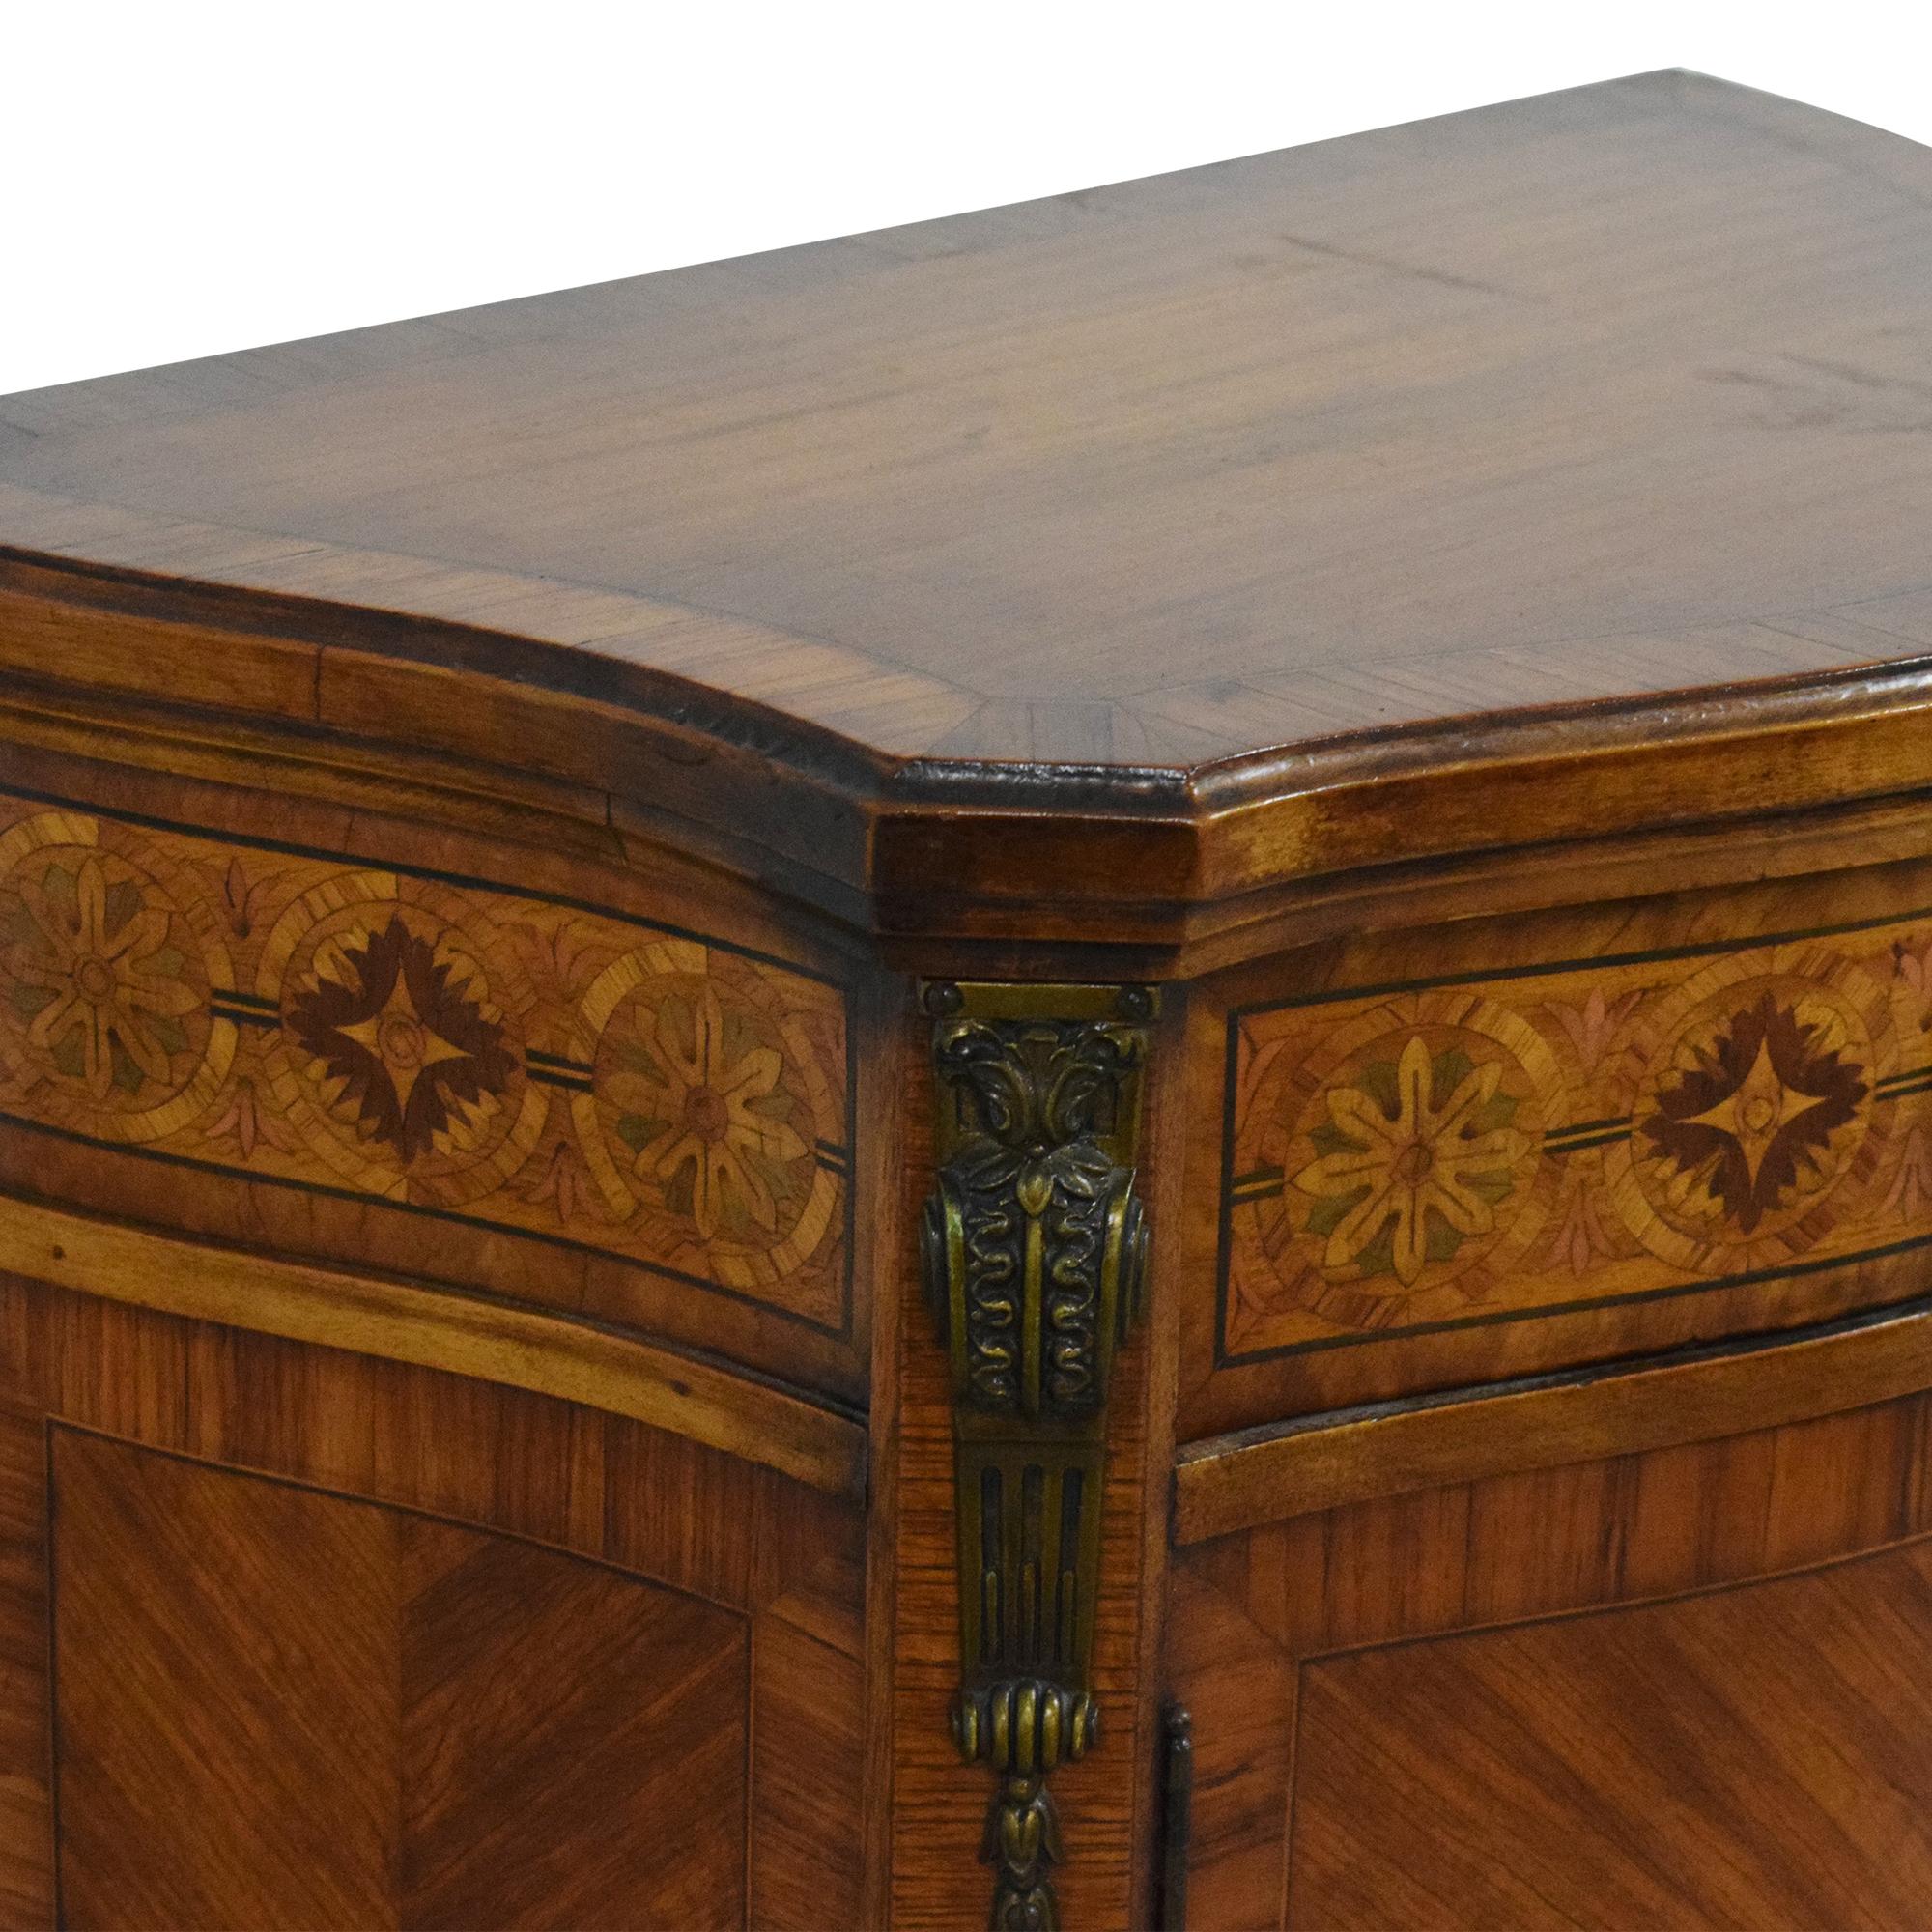 Bethlehem Furniture Company End Tables / Tables